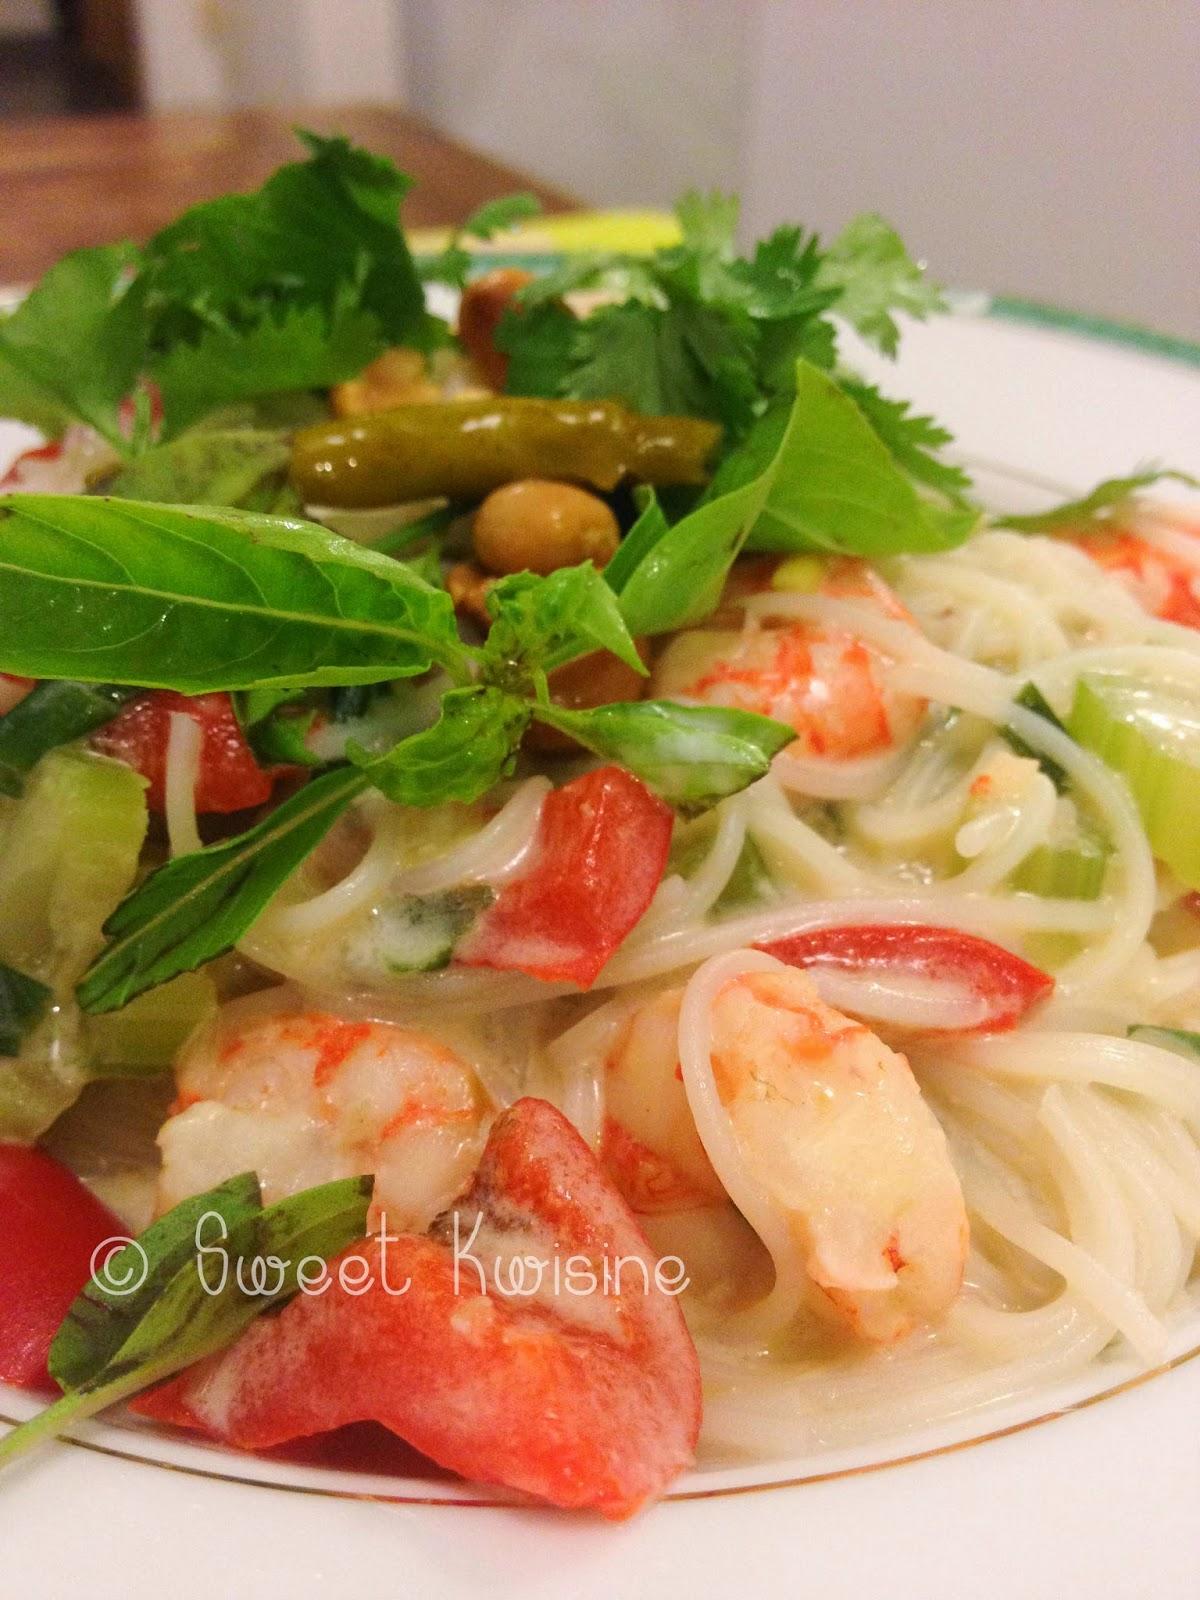 Sweet Kwisine, nouilles, crevette, lait de coco, cuisine asiatique, coriandre, cèleri, piment, cuisine facile